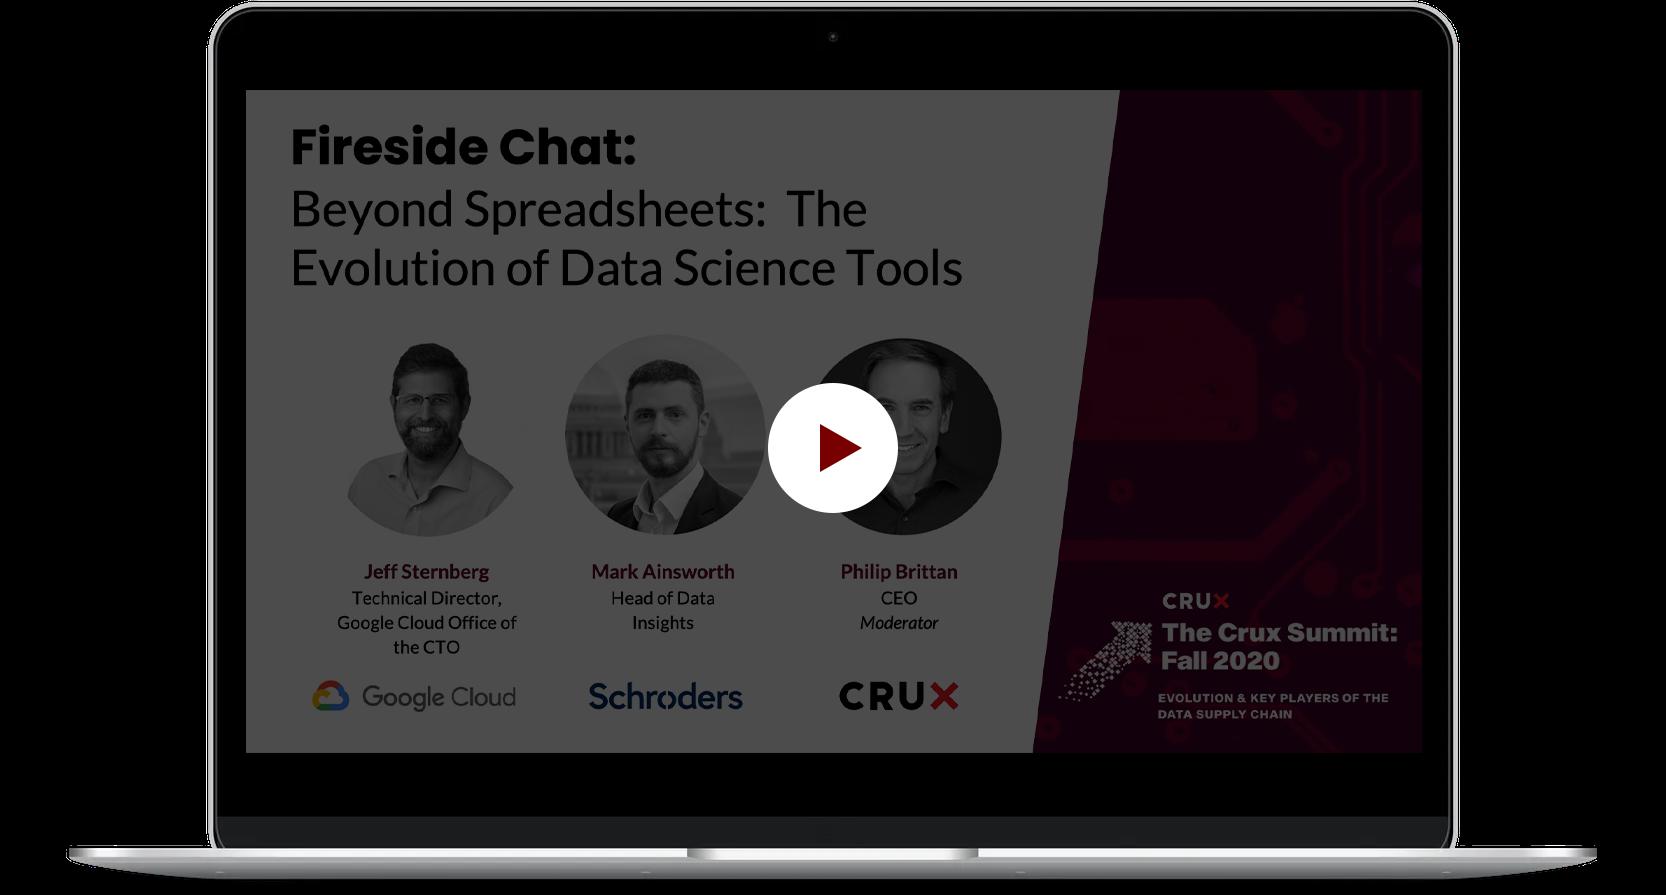 Crux_TCS_FiresideChat+BeyondSpreadsheets+TheEvolutionofDataScienceTools_12